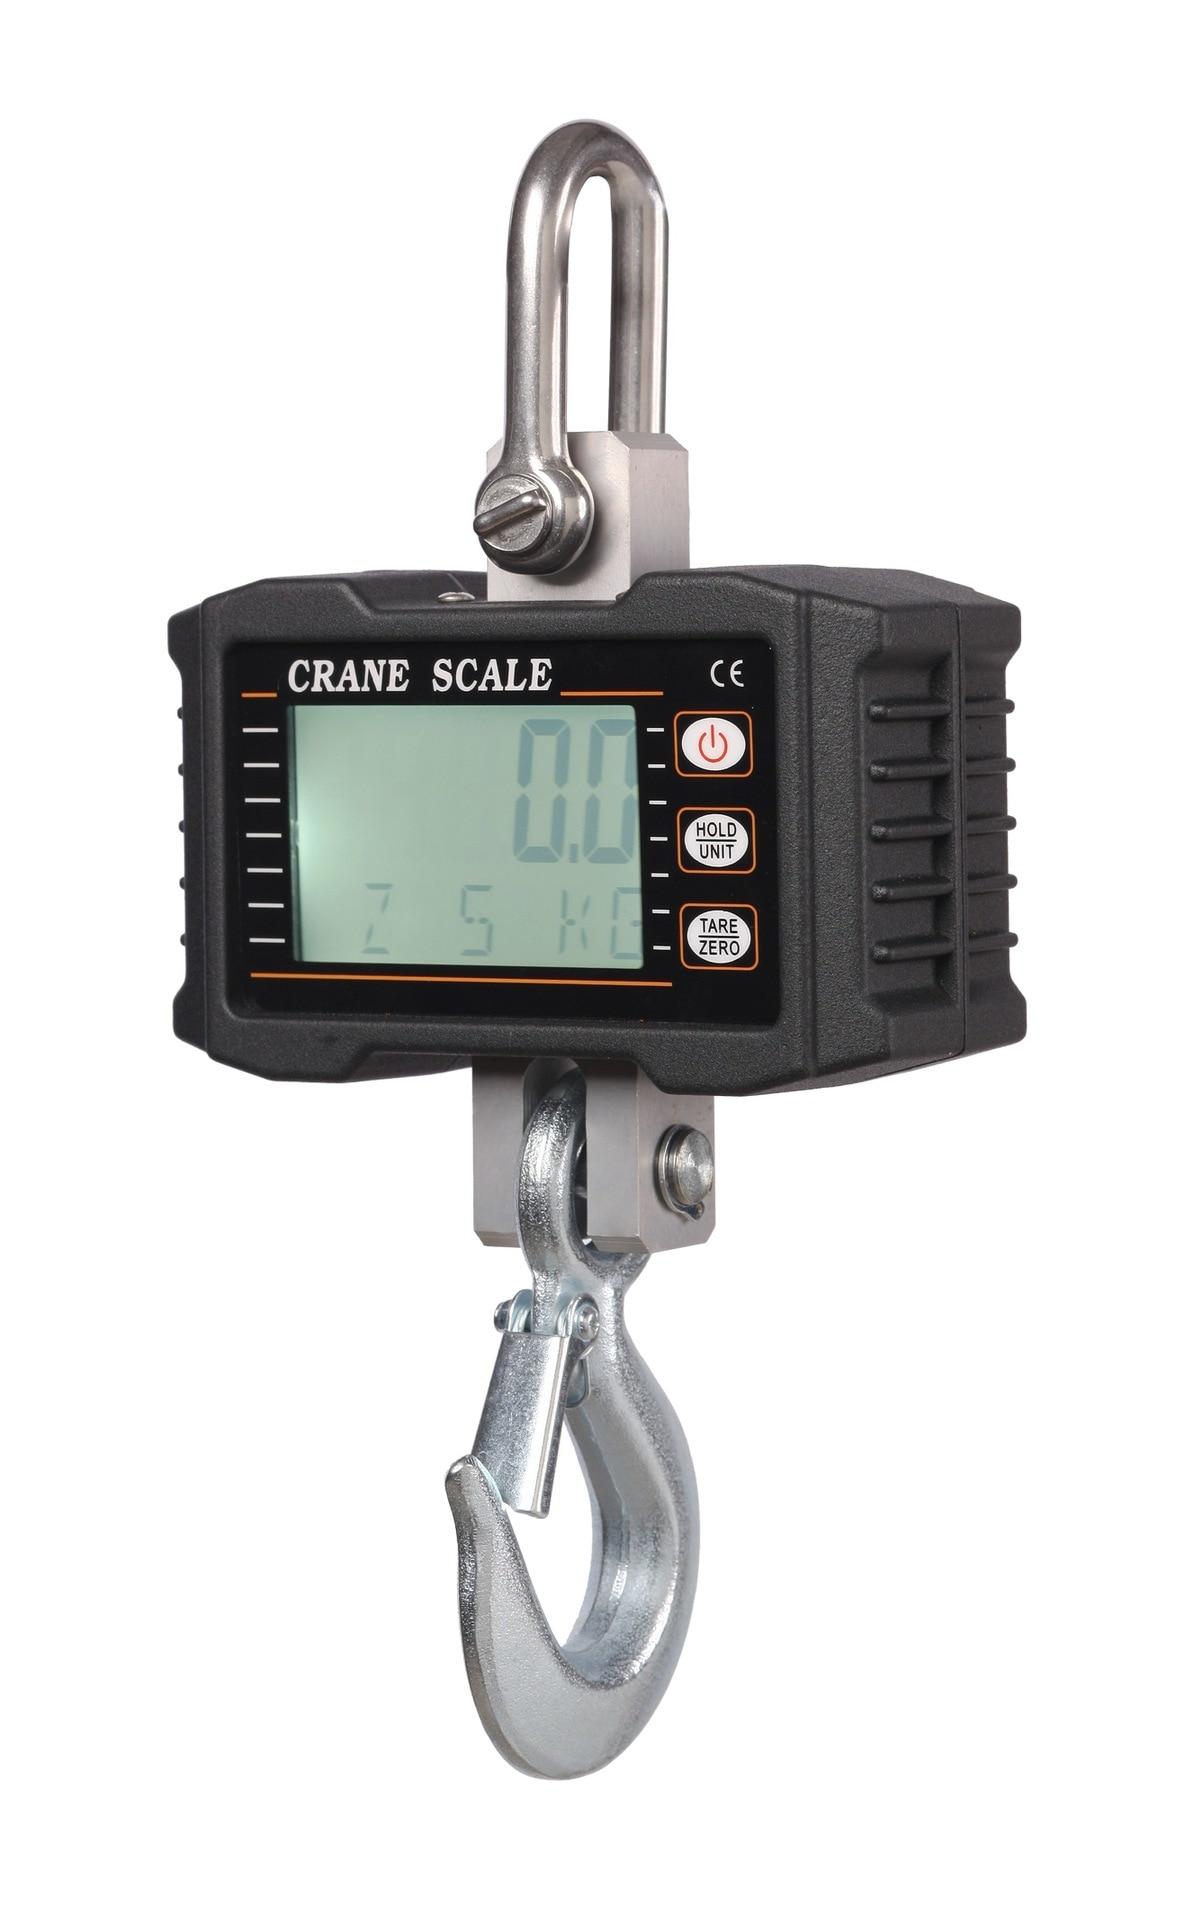 2018 HOT 1000kg 1T Digital Crane Hanging Scale Heavy Duty Industrial LCD Digital Display Hanging Hook Crane Scale цена